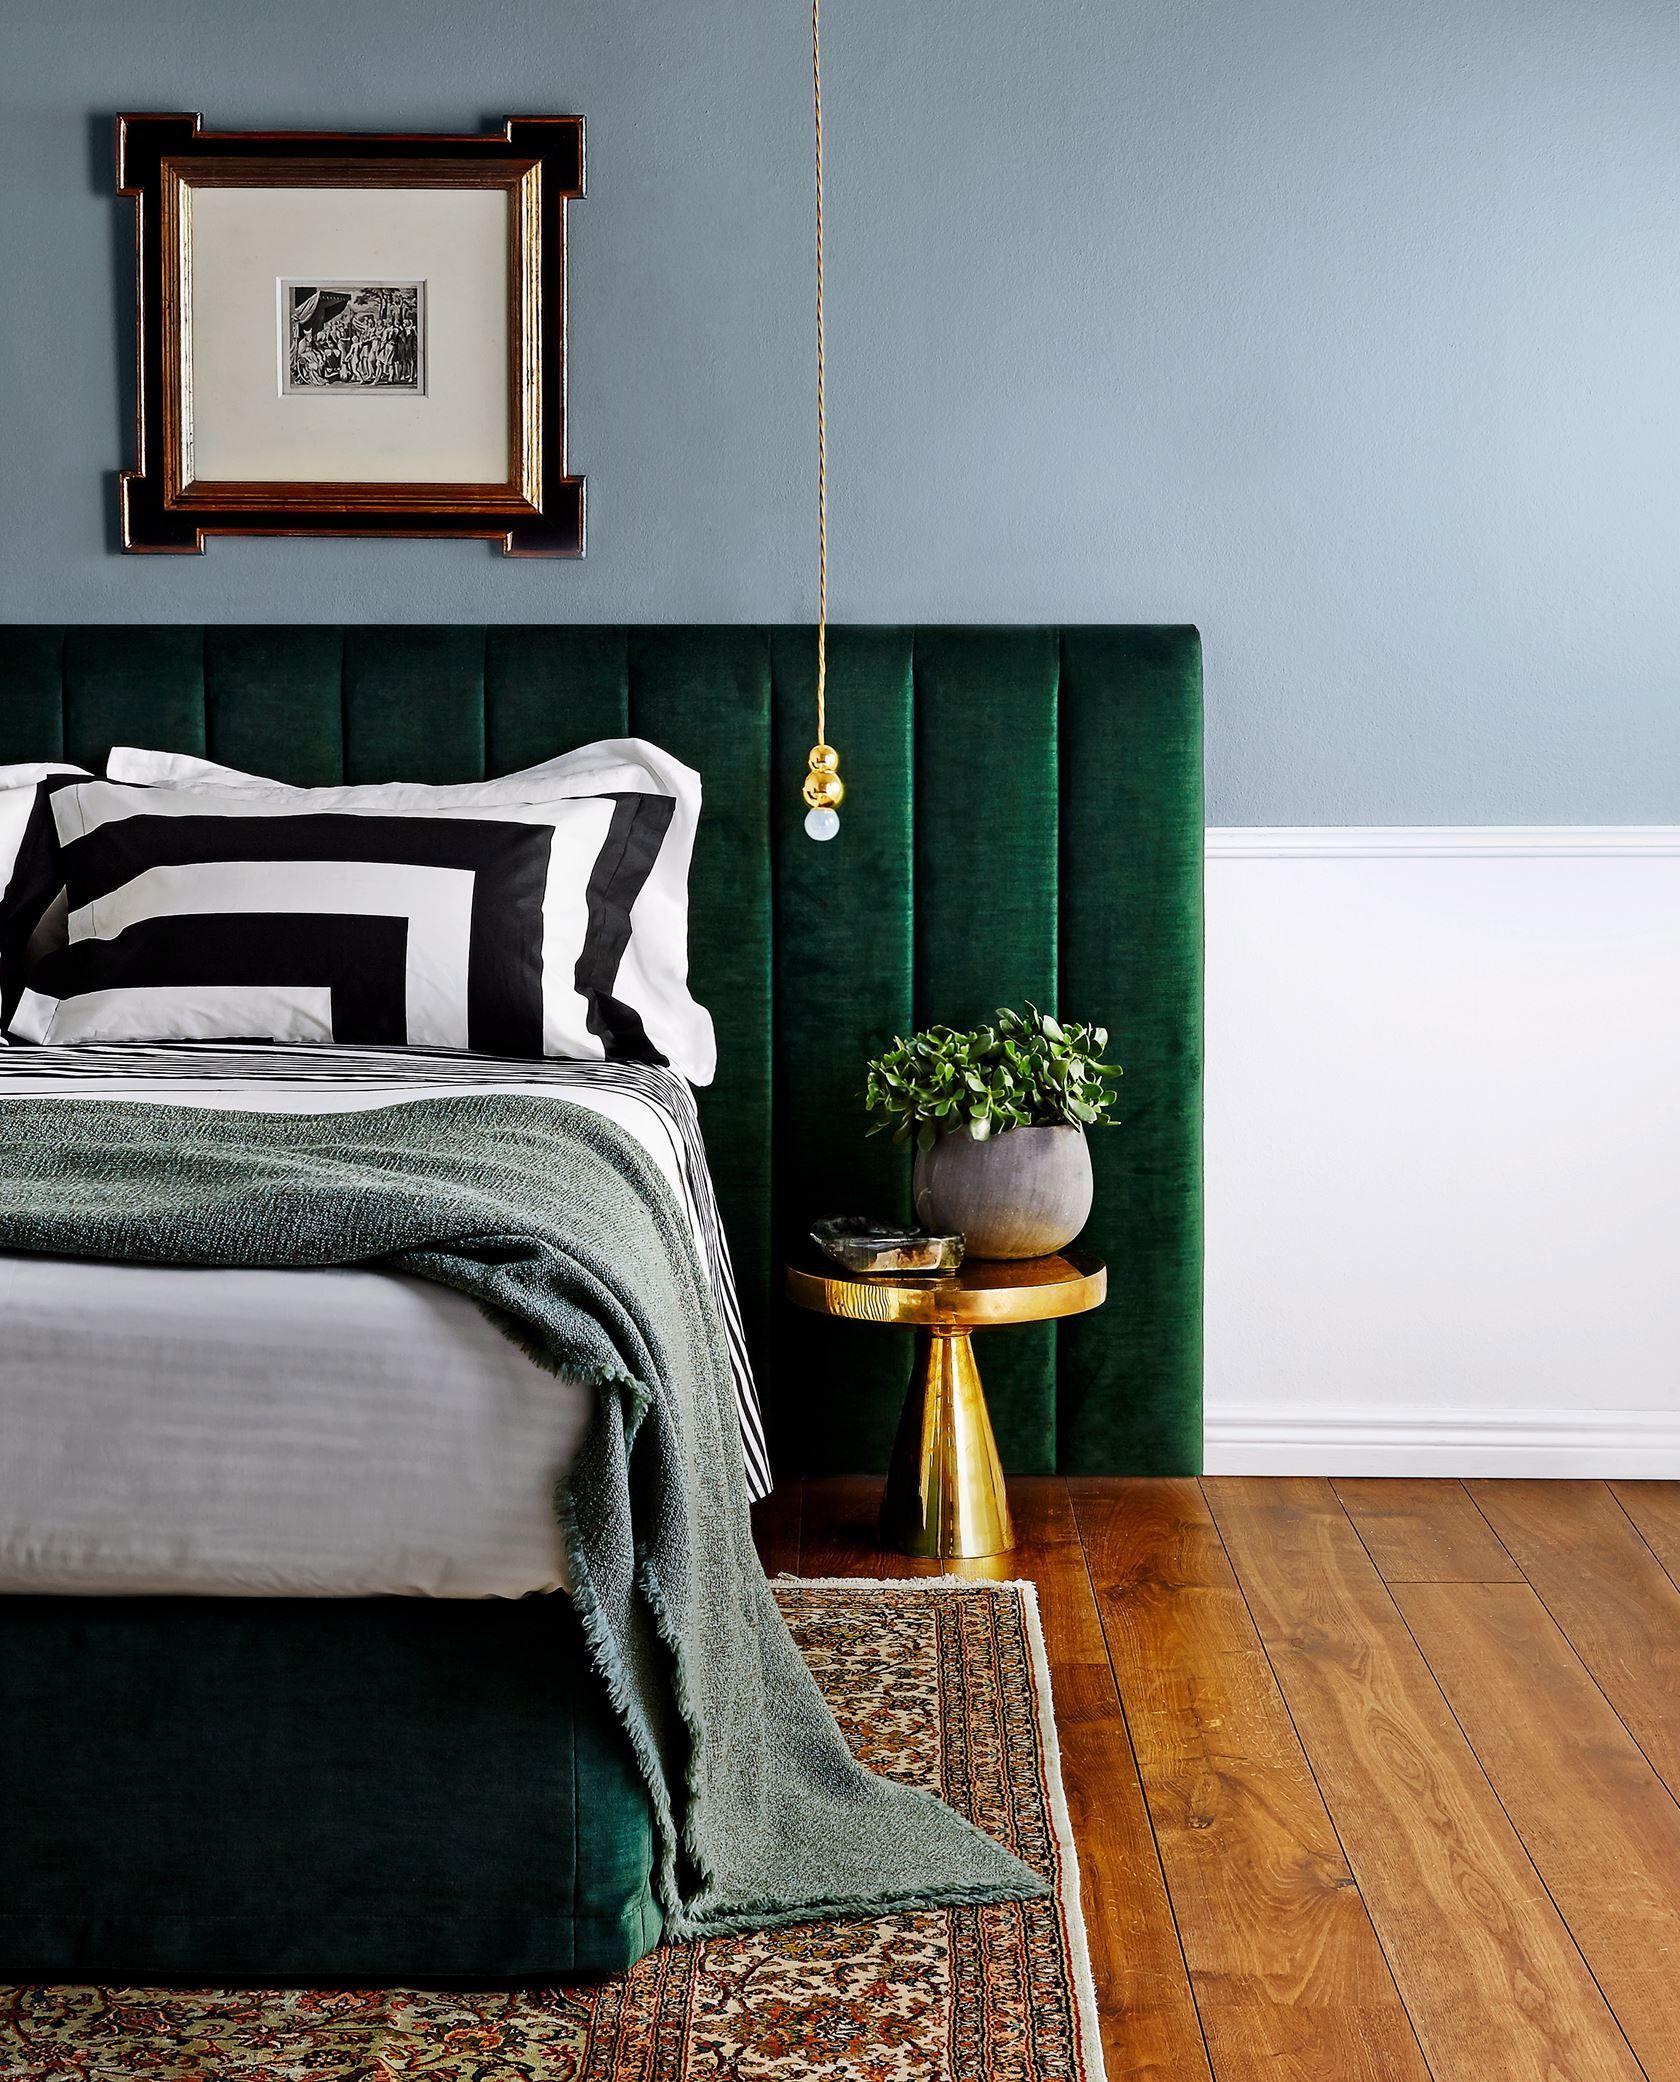 20 popular bedroom paint colors that give you positive vibes rh pinterest com